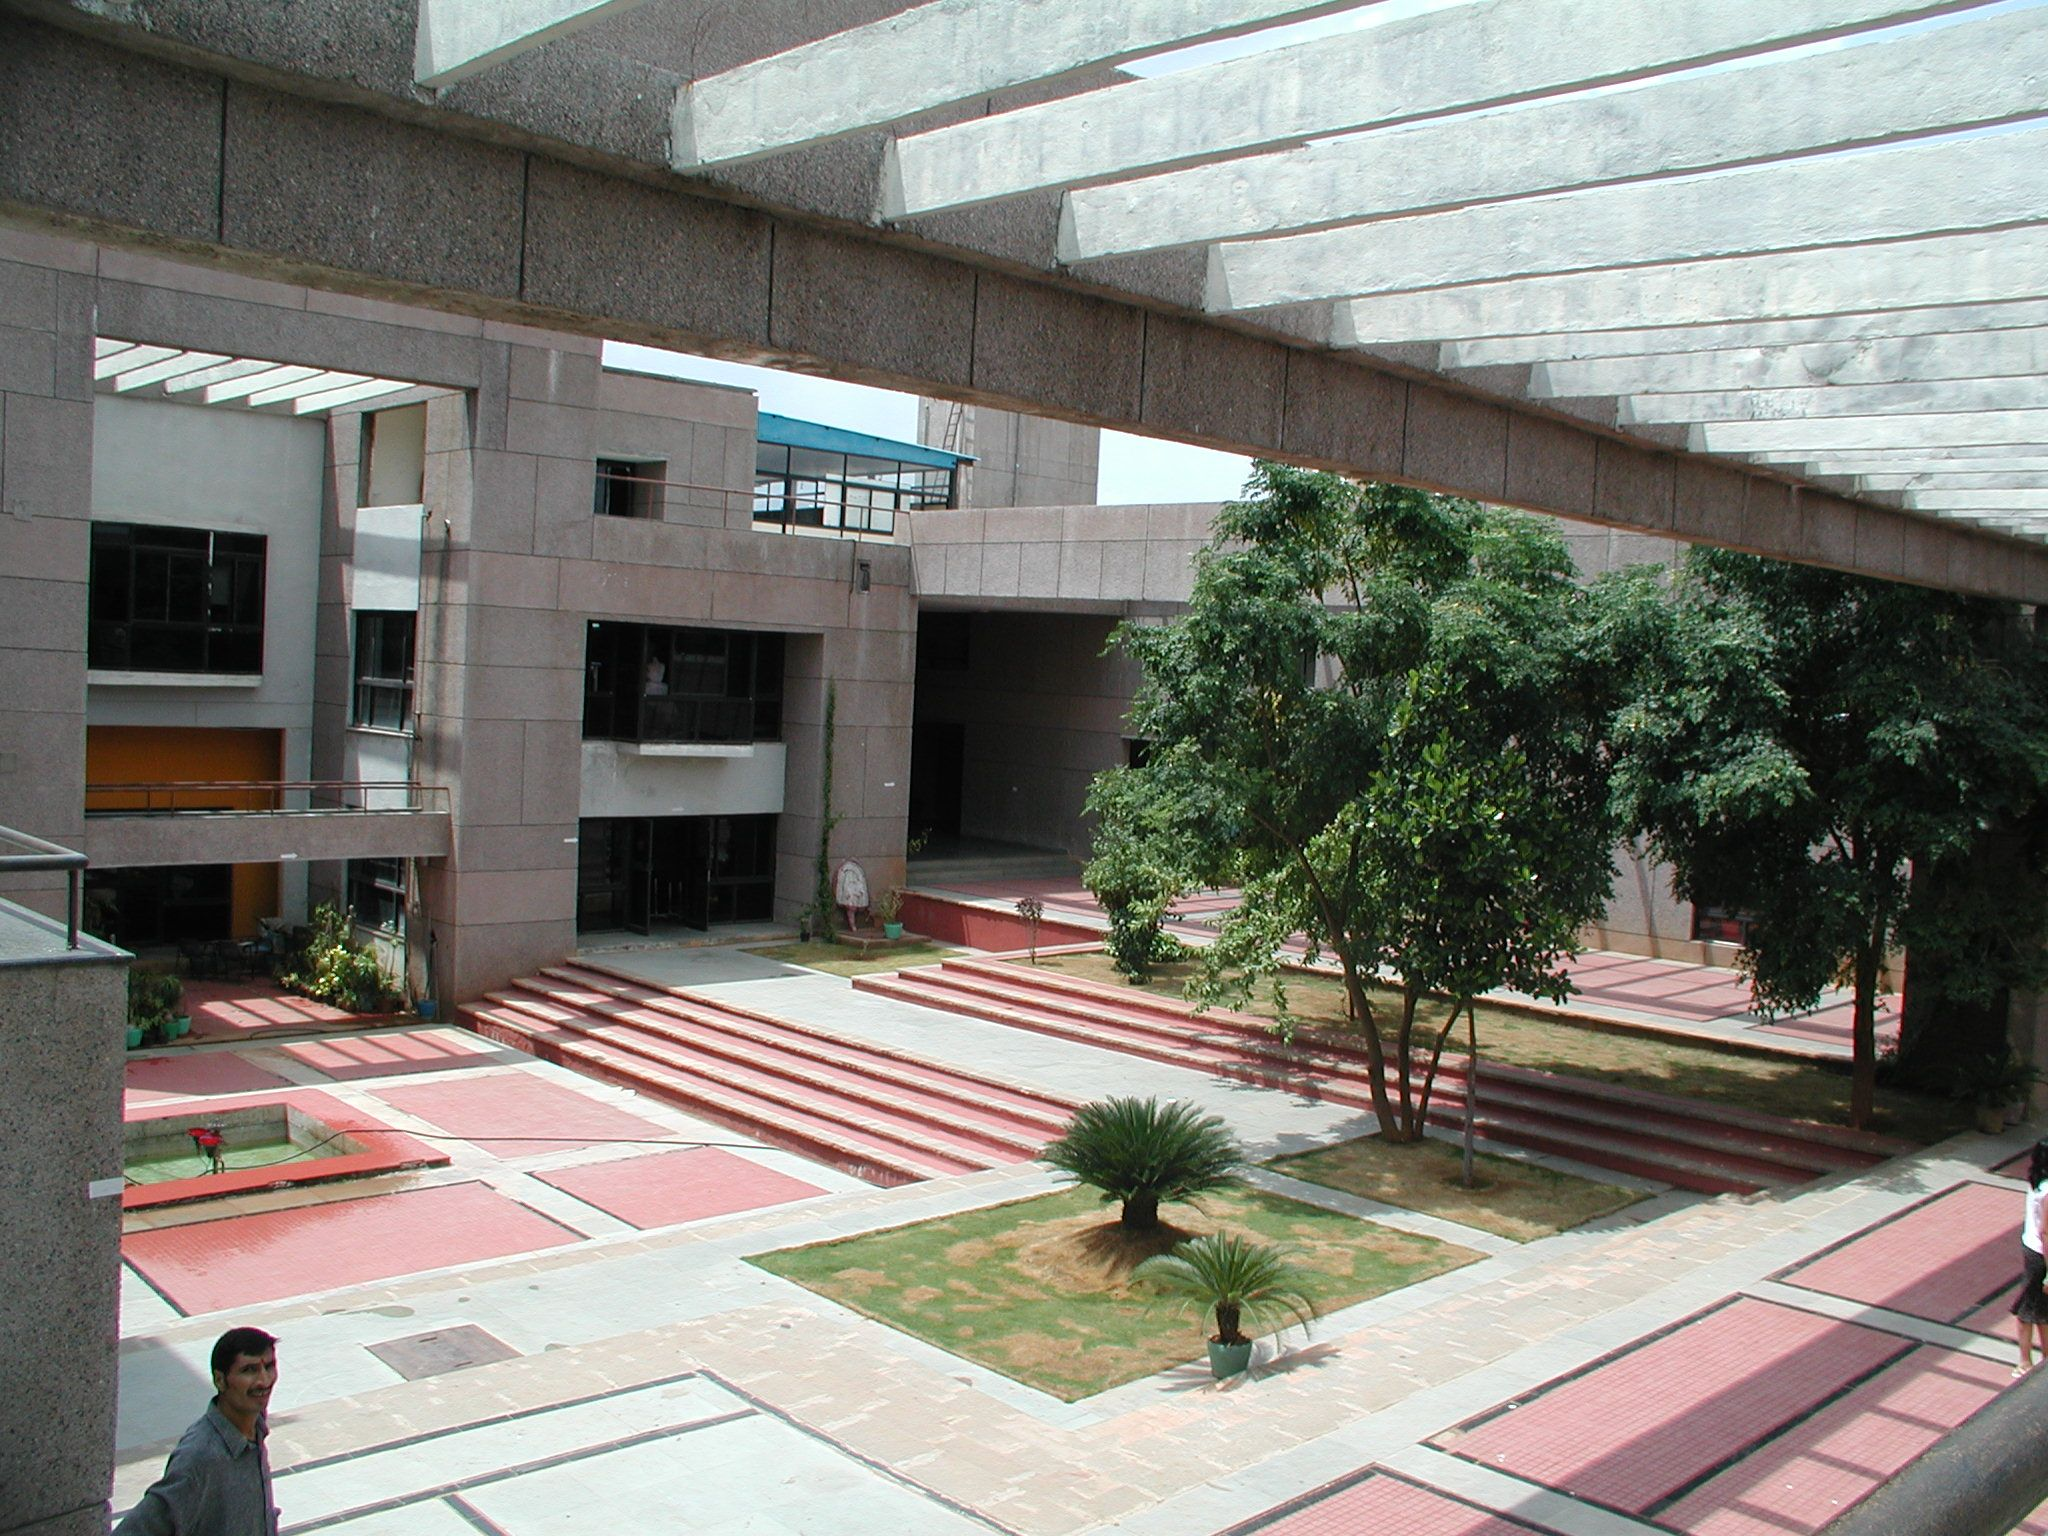 National Institute Of Fashion Technology Delhi Architecture Outdoor Decor Technology Fashion